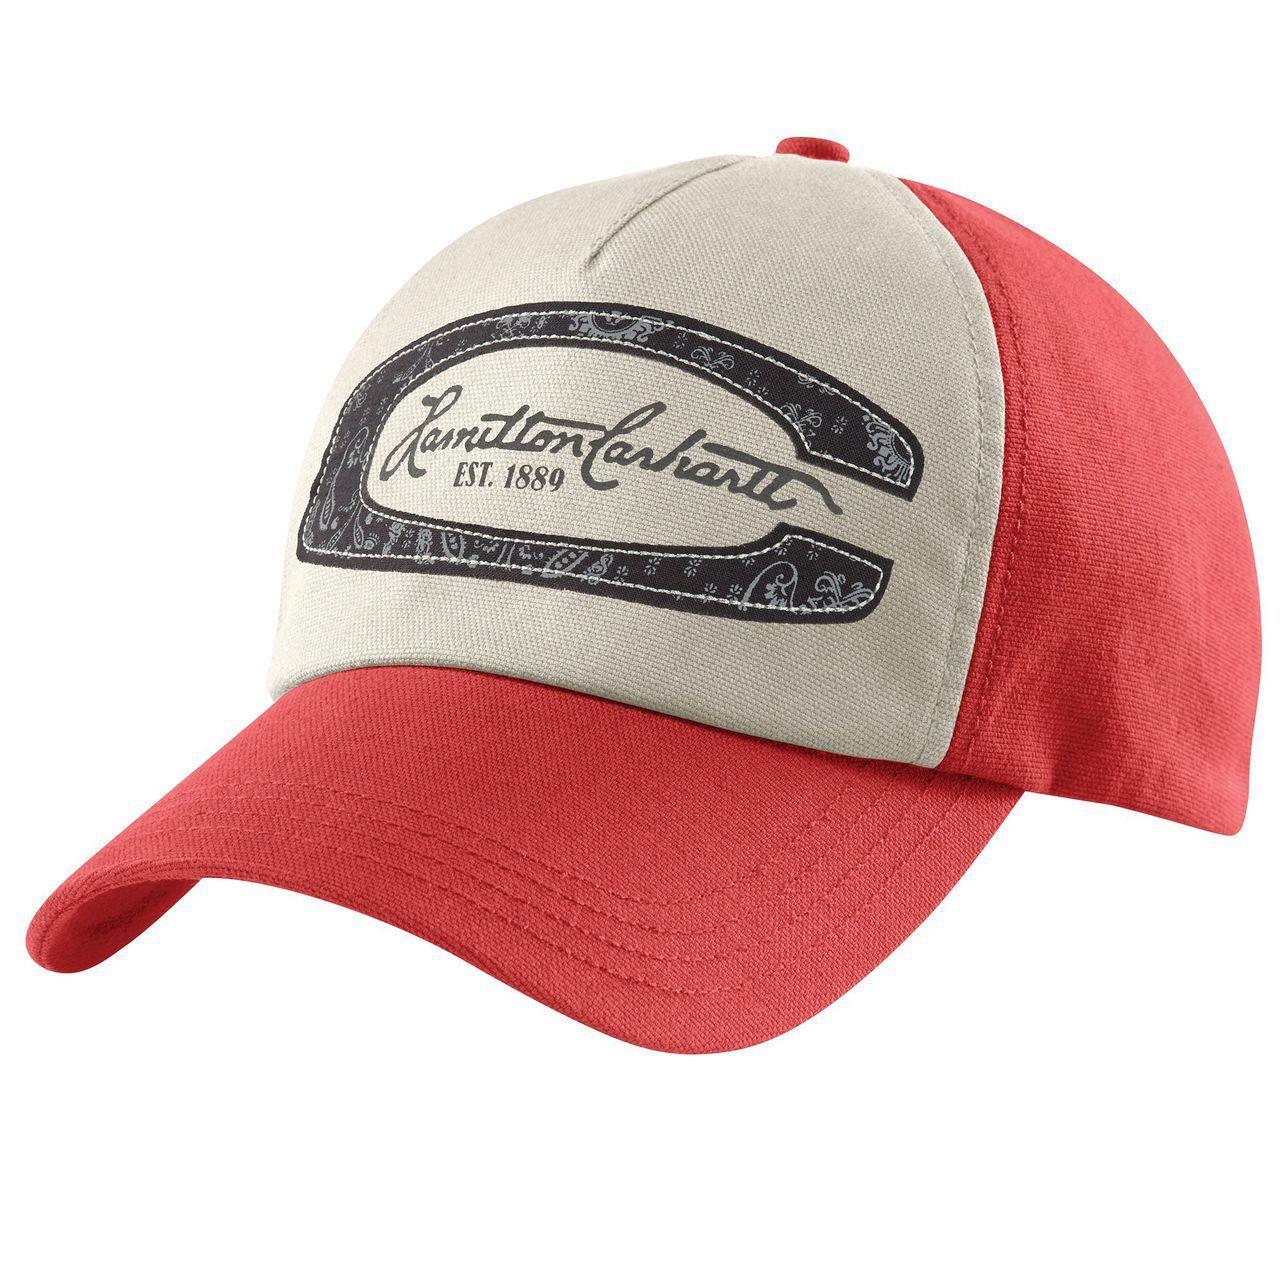 94a0af408db WOMEN S LAWSON CAP - The Brown Duck